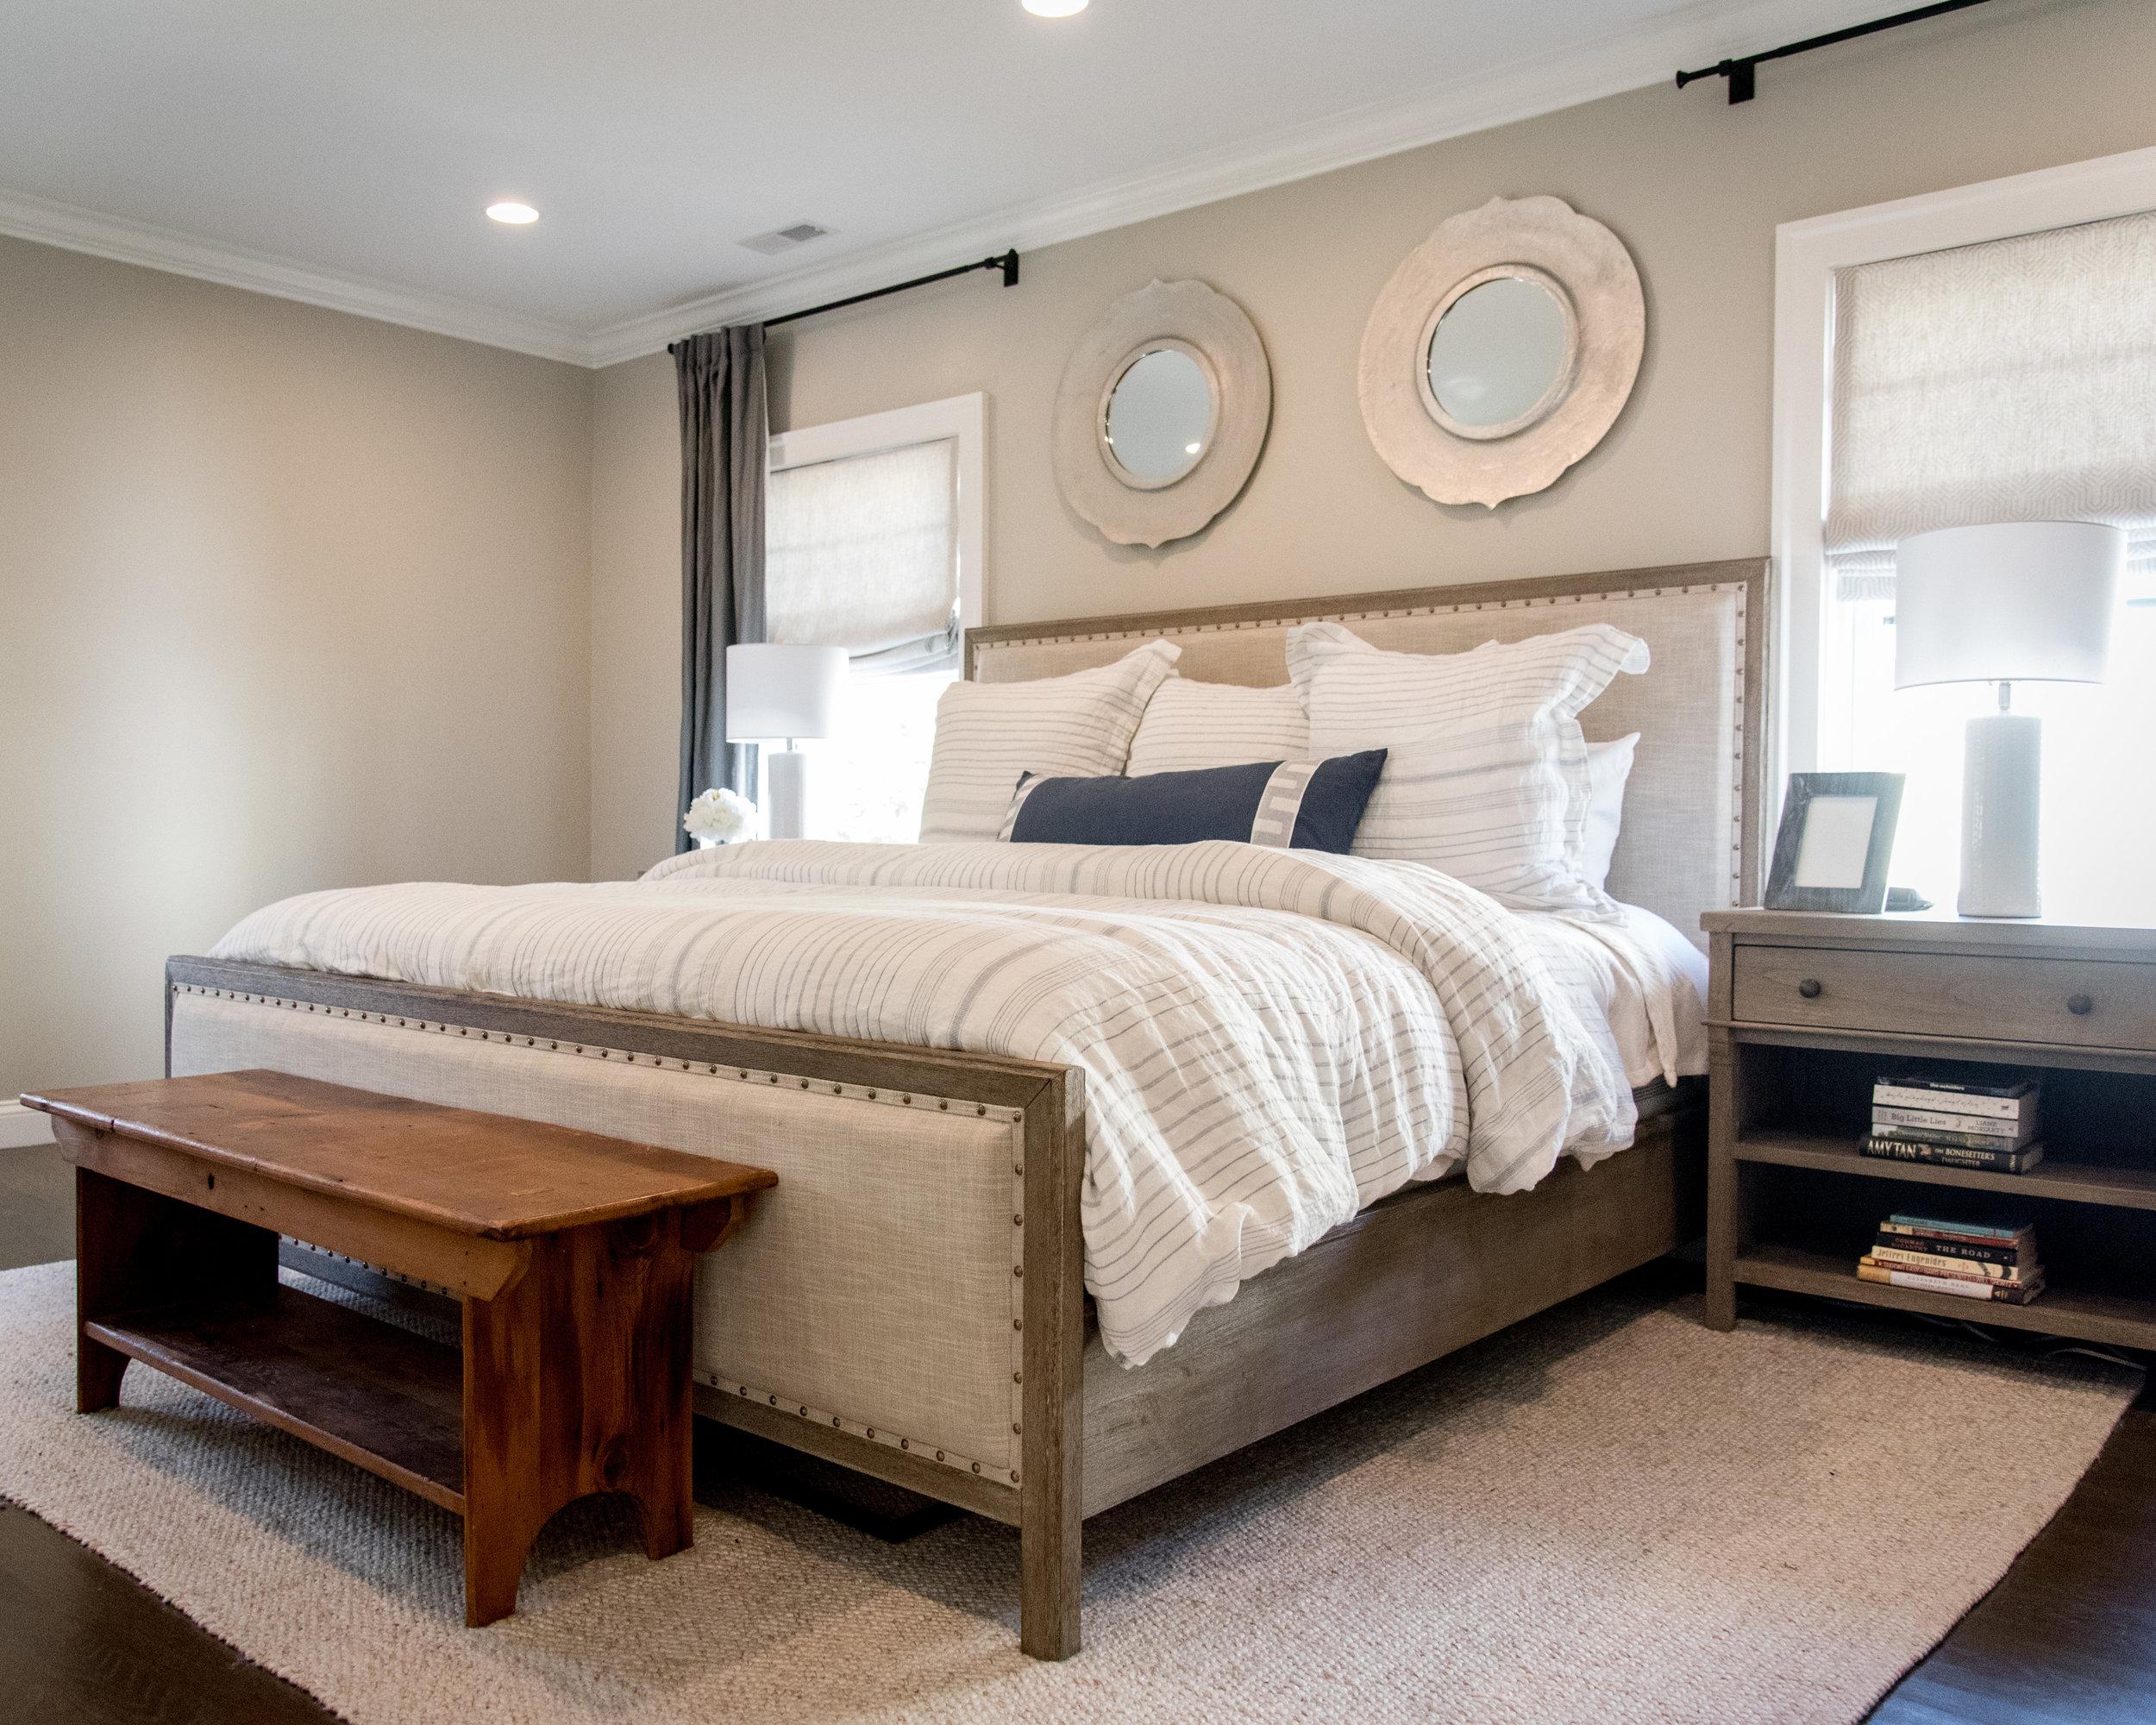 Interior Design Newton Massachusetts decor interior designer Gina Baran Bedroom Design